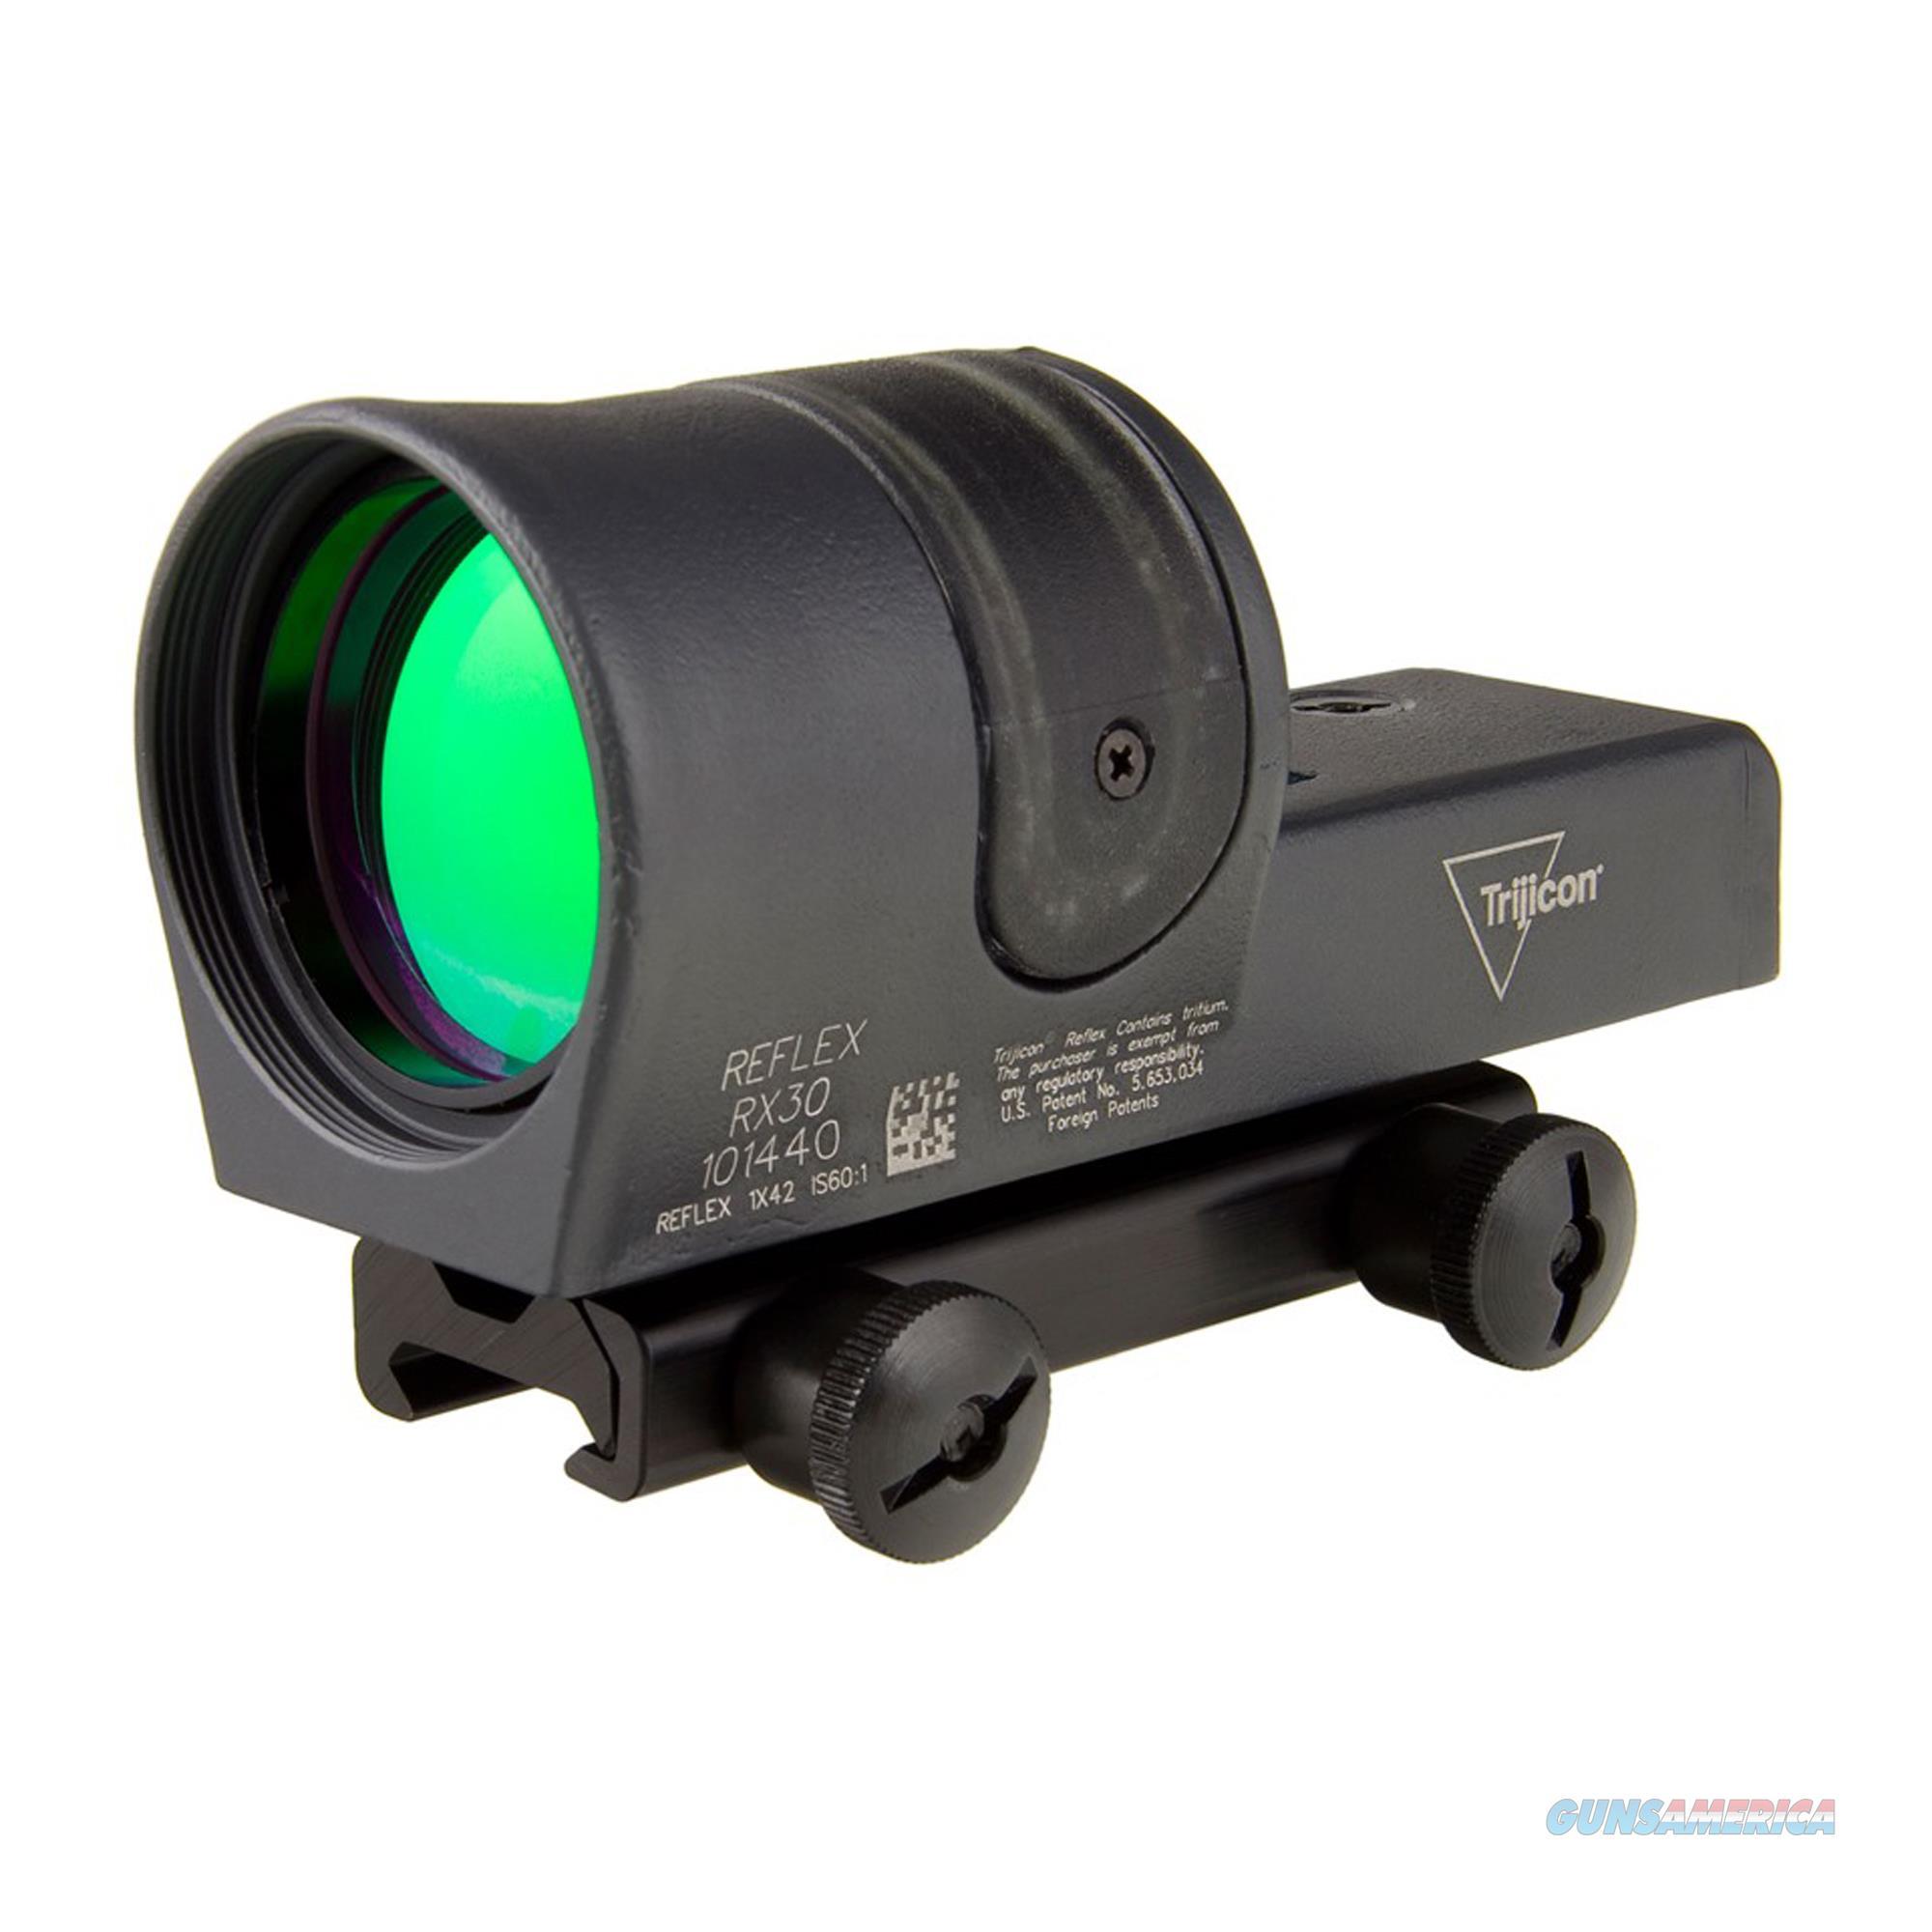 Trijicon Reflex 1X42mm Sight RX30-C-800089  Non-Guns > Iron/Metal/Peep Sights